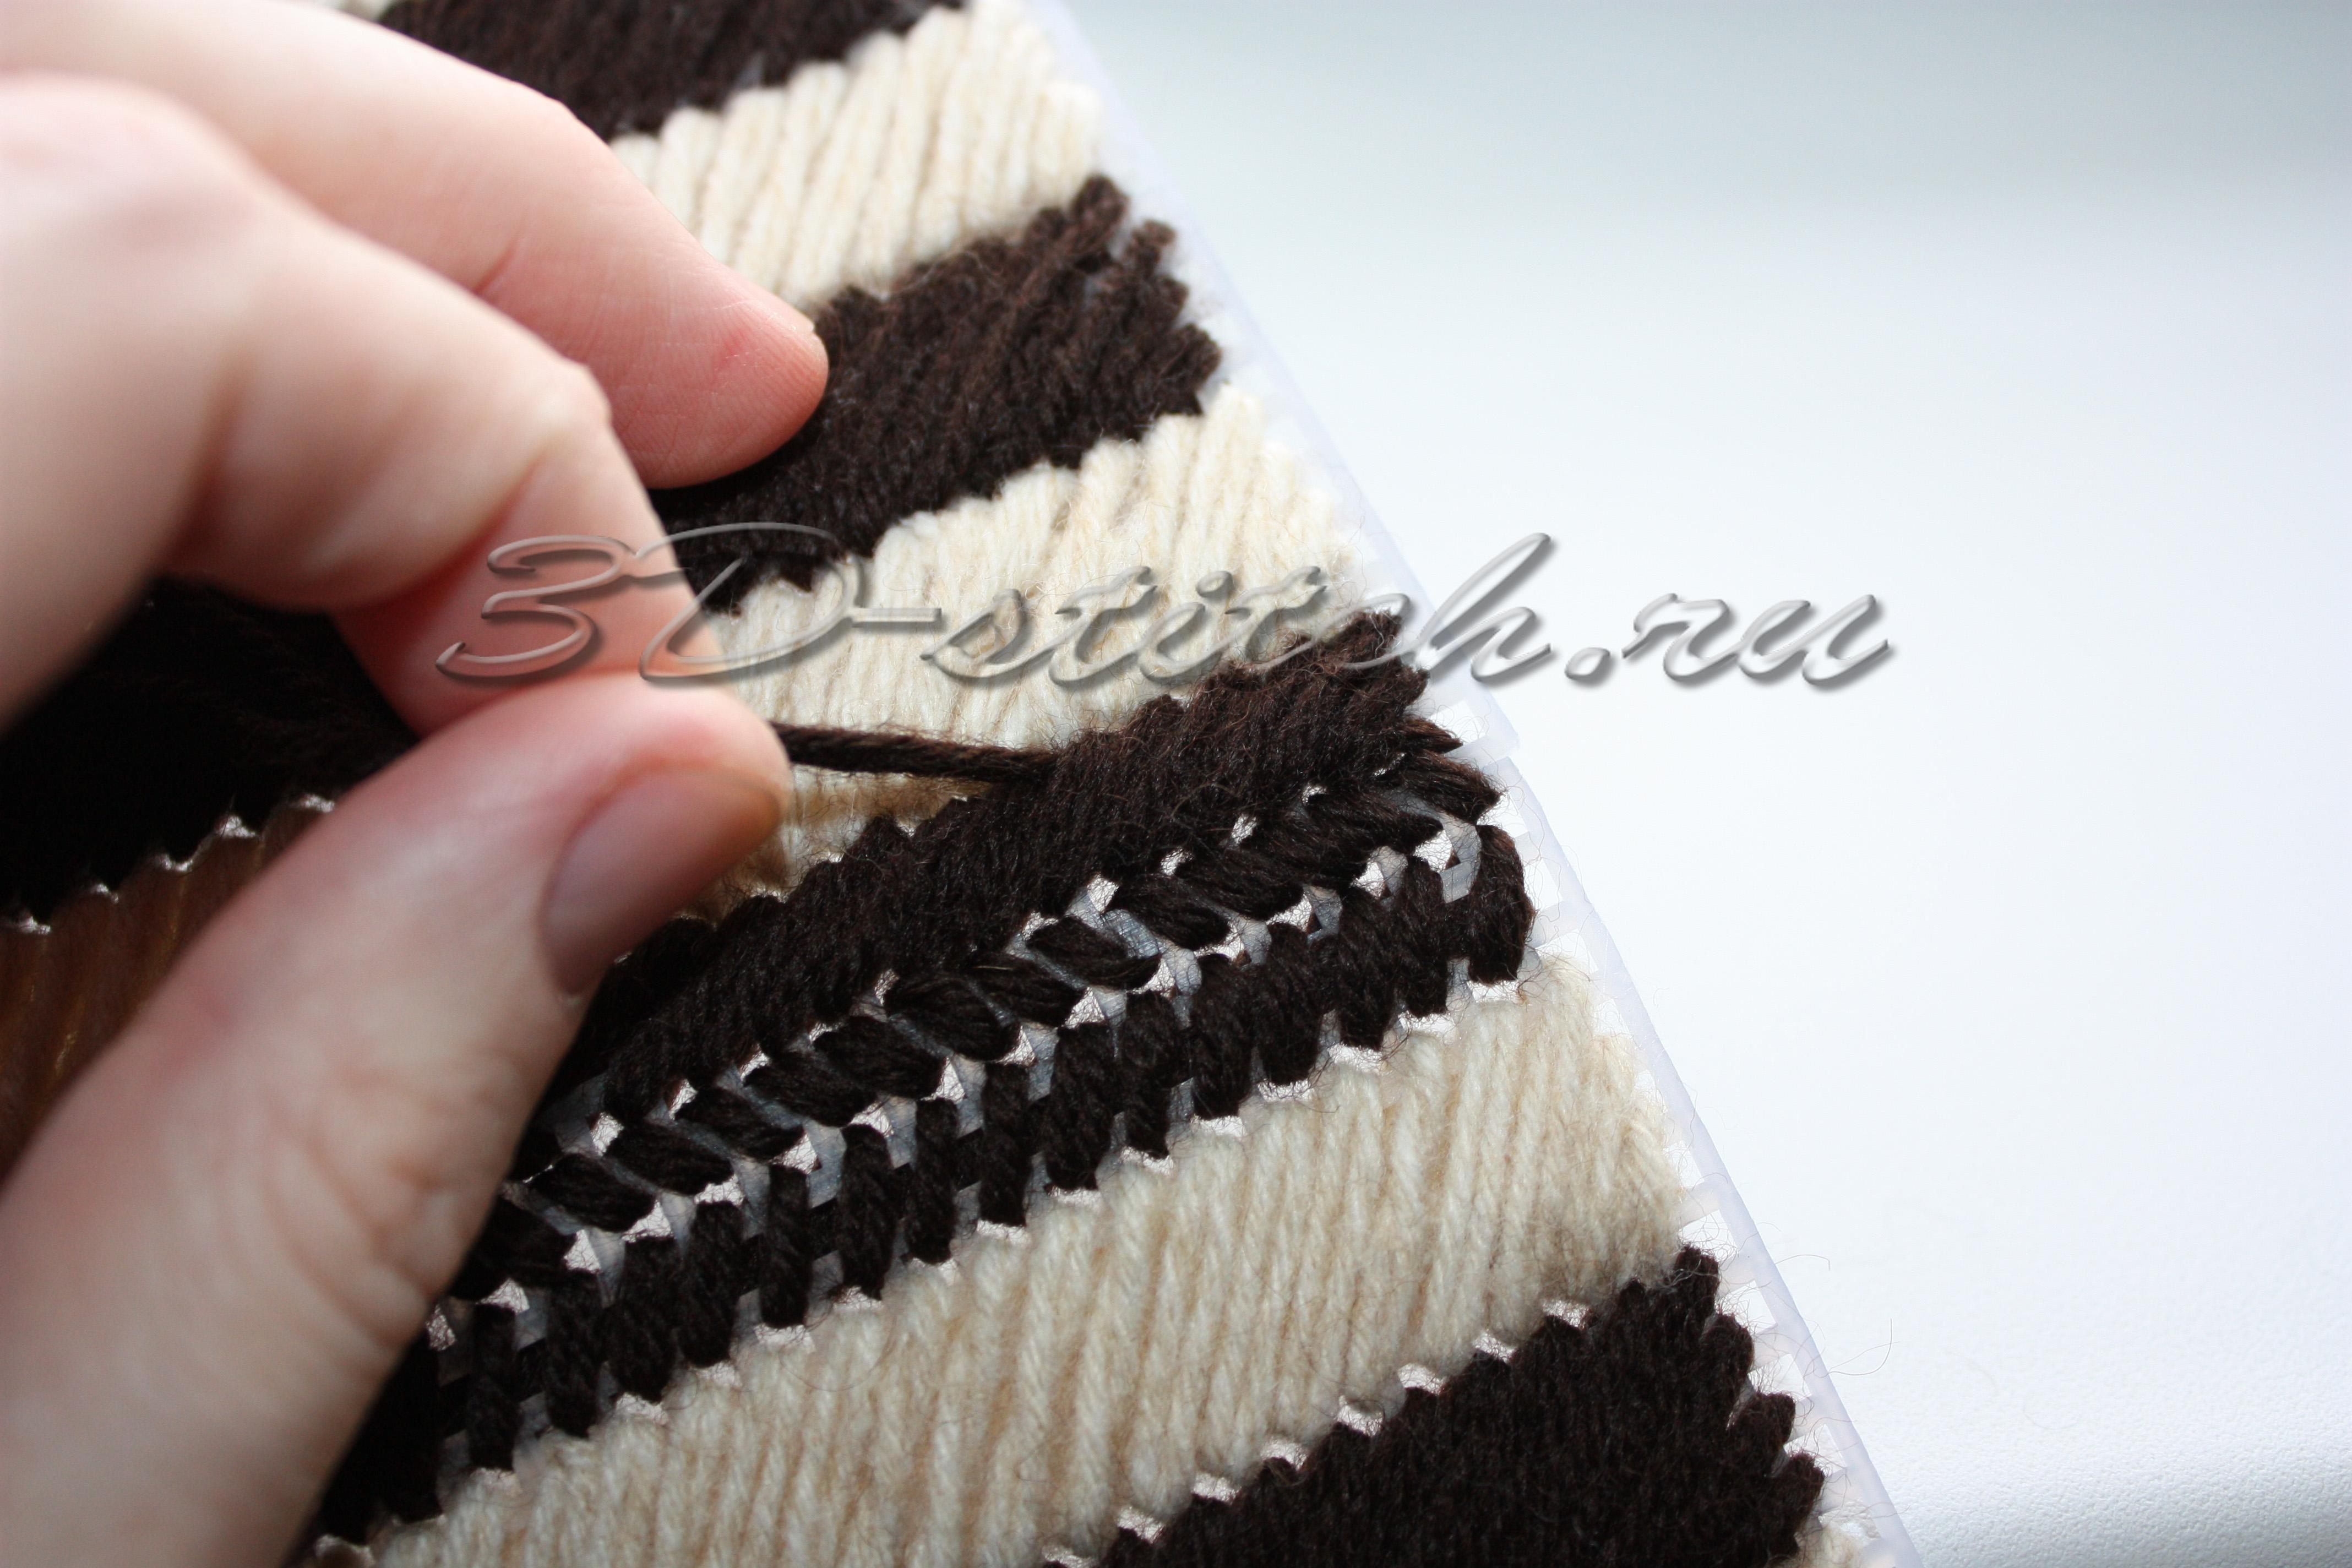 Объемная вышивка - мастер-класс - Вышитая шкатулка - Этап 4 - Сборка шкатулки